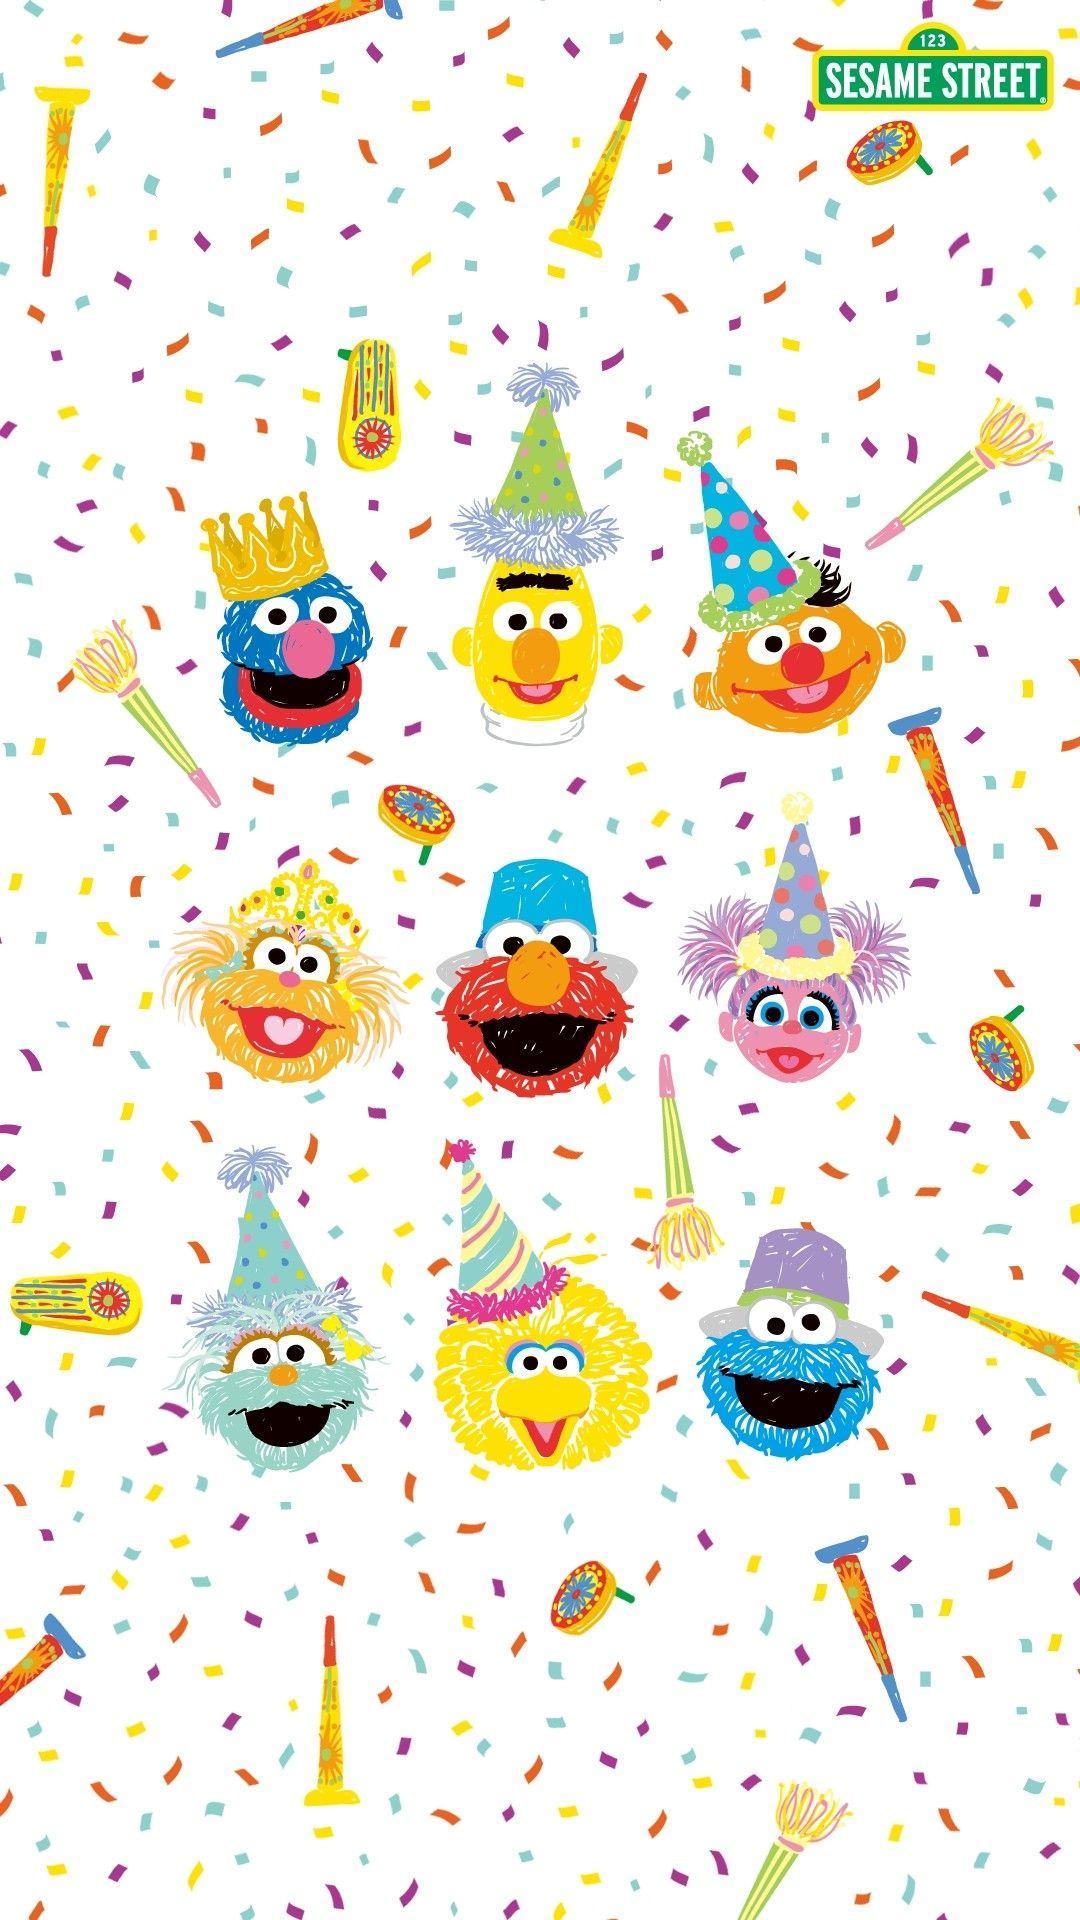 Sesame Street Wallpapers - Wallpaper Cave